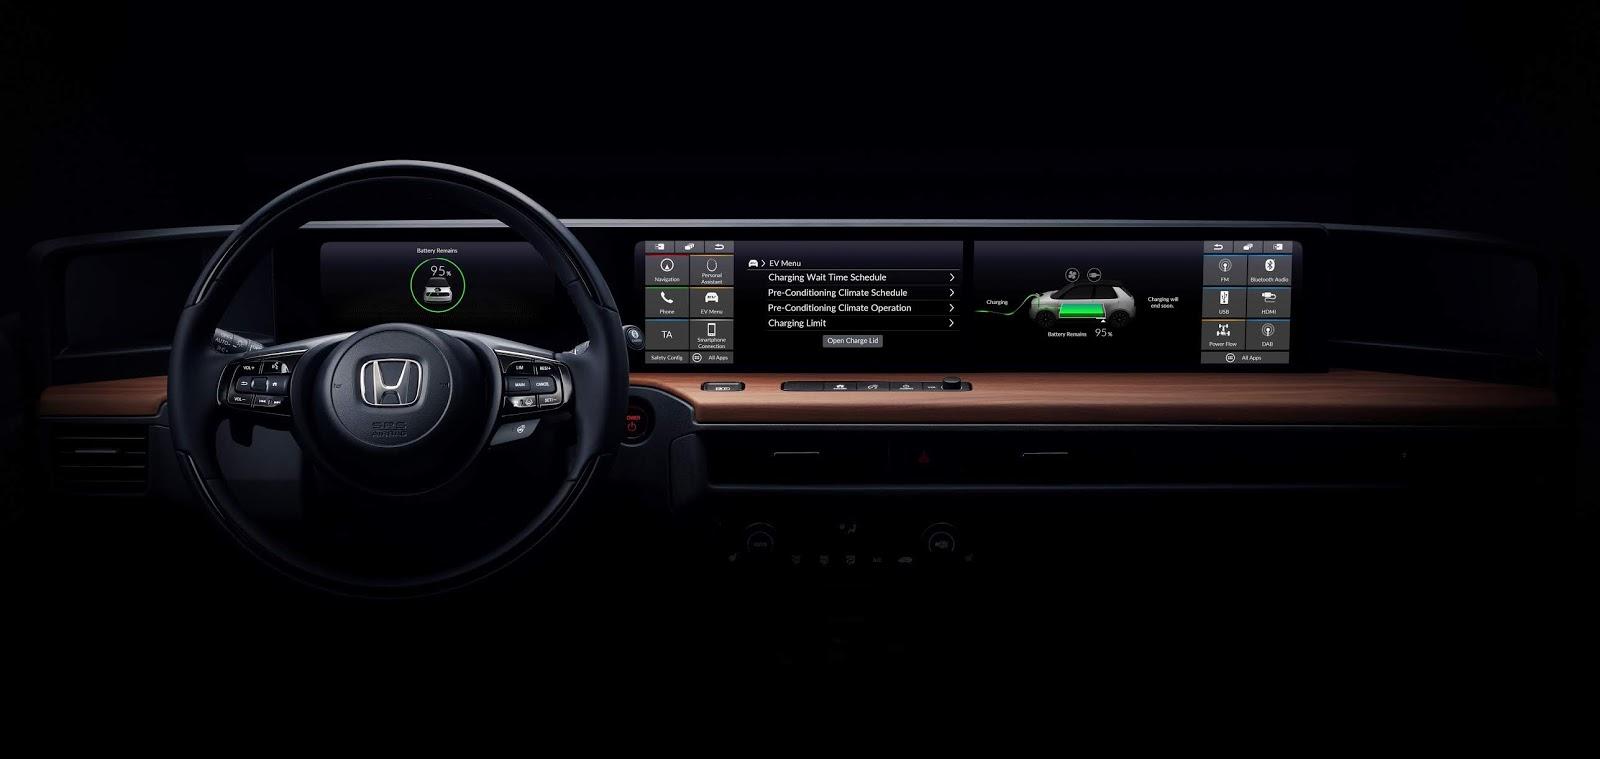 161758 Honda reveals first glimpse at interior of electric vehicle prototype bound Πρώτη γεύση από το ηλεκτρικό concept της Honda Honda, Έκθεση Γενεύης, Σαλόνι Αυτοκινήτου της Γενεύης